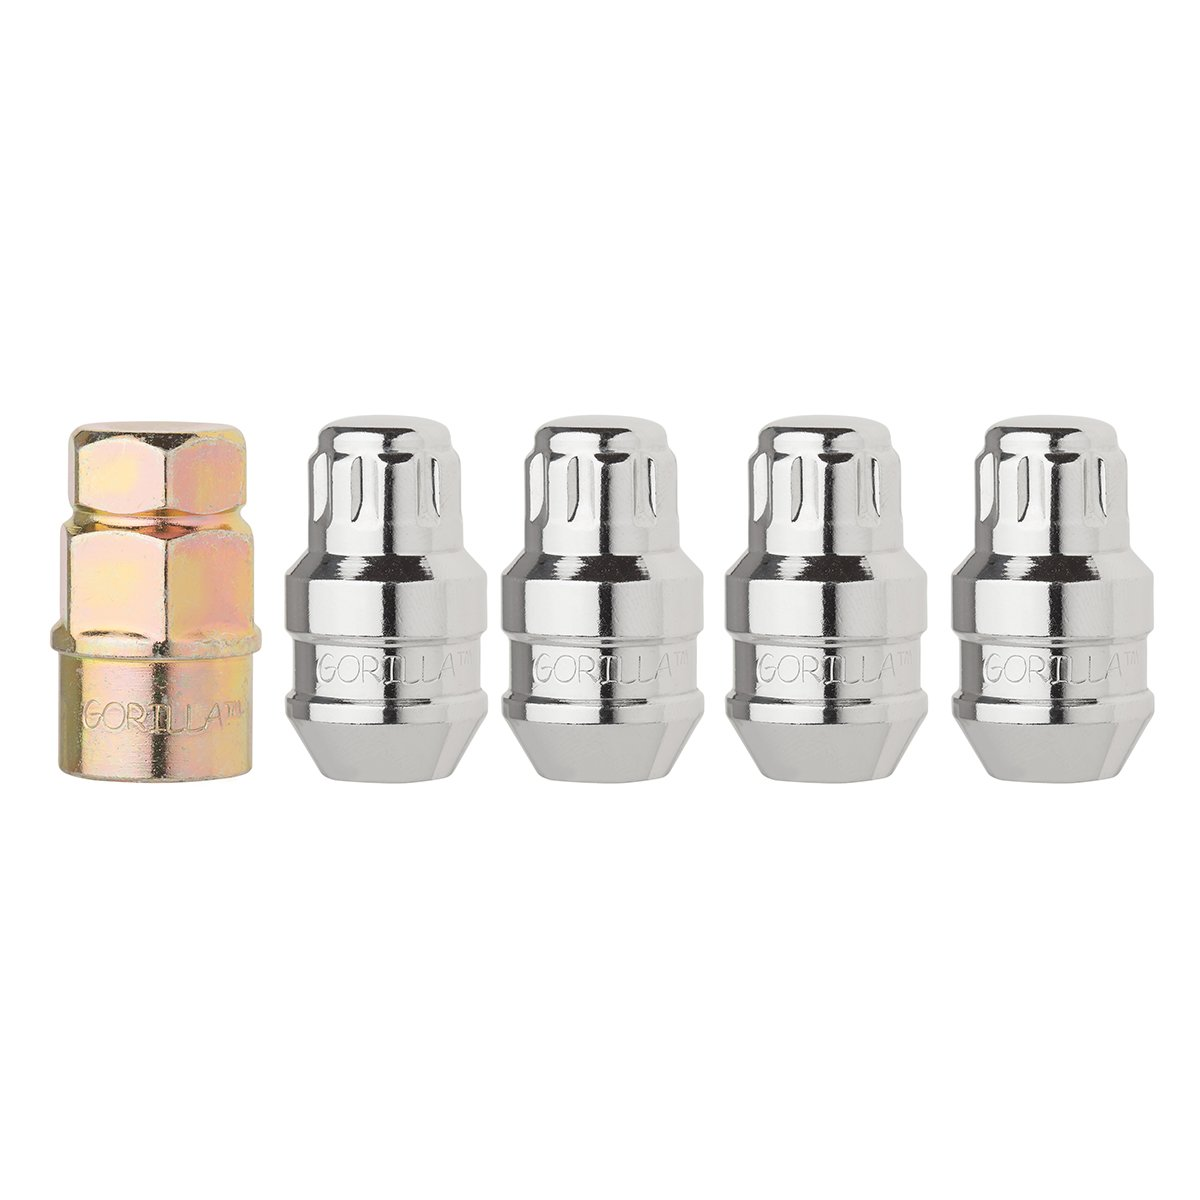 DPAccessories LCB3L2HC-CH06LK4 Set of 4 Chrome Closed Acorn Locking Lug Nuts/Wheel Locks - 1/2-20 - Dual Hex Wheel Lock Set